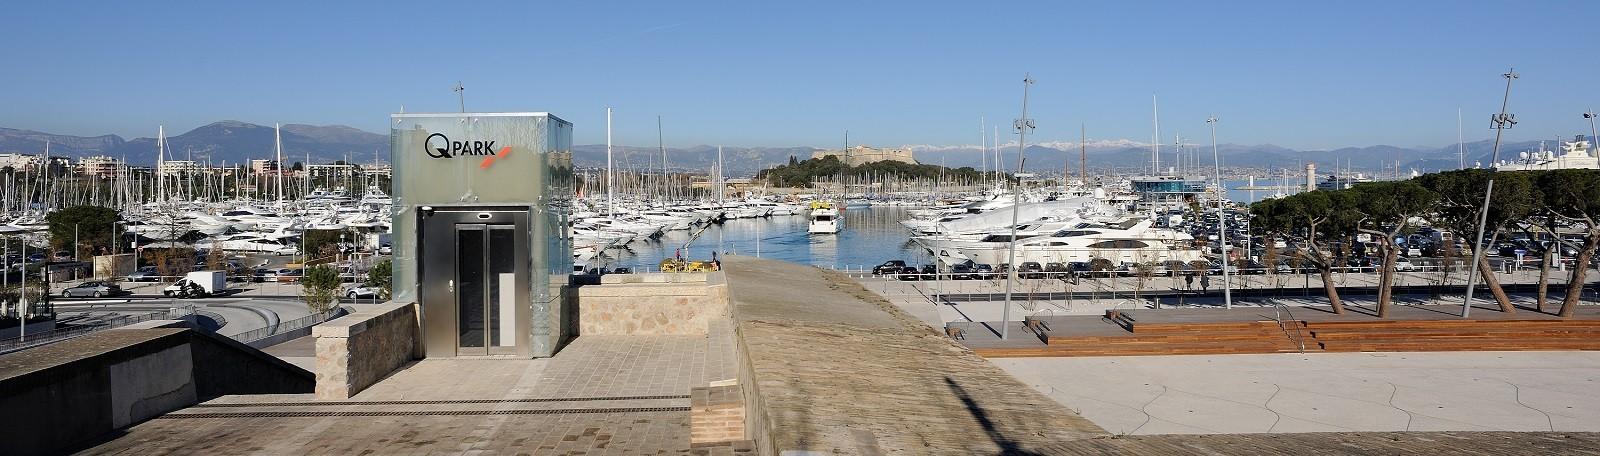 Parking Port d'Antibes - Parkeren in Antibes | Q-Park